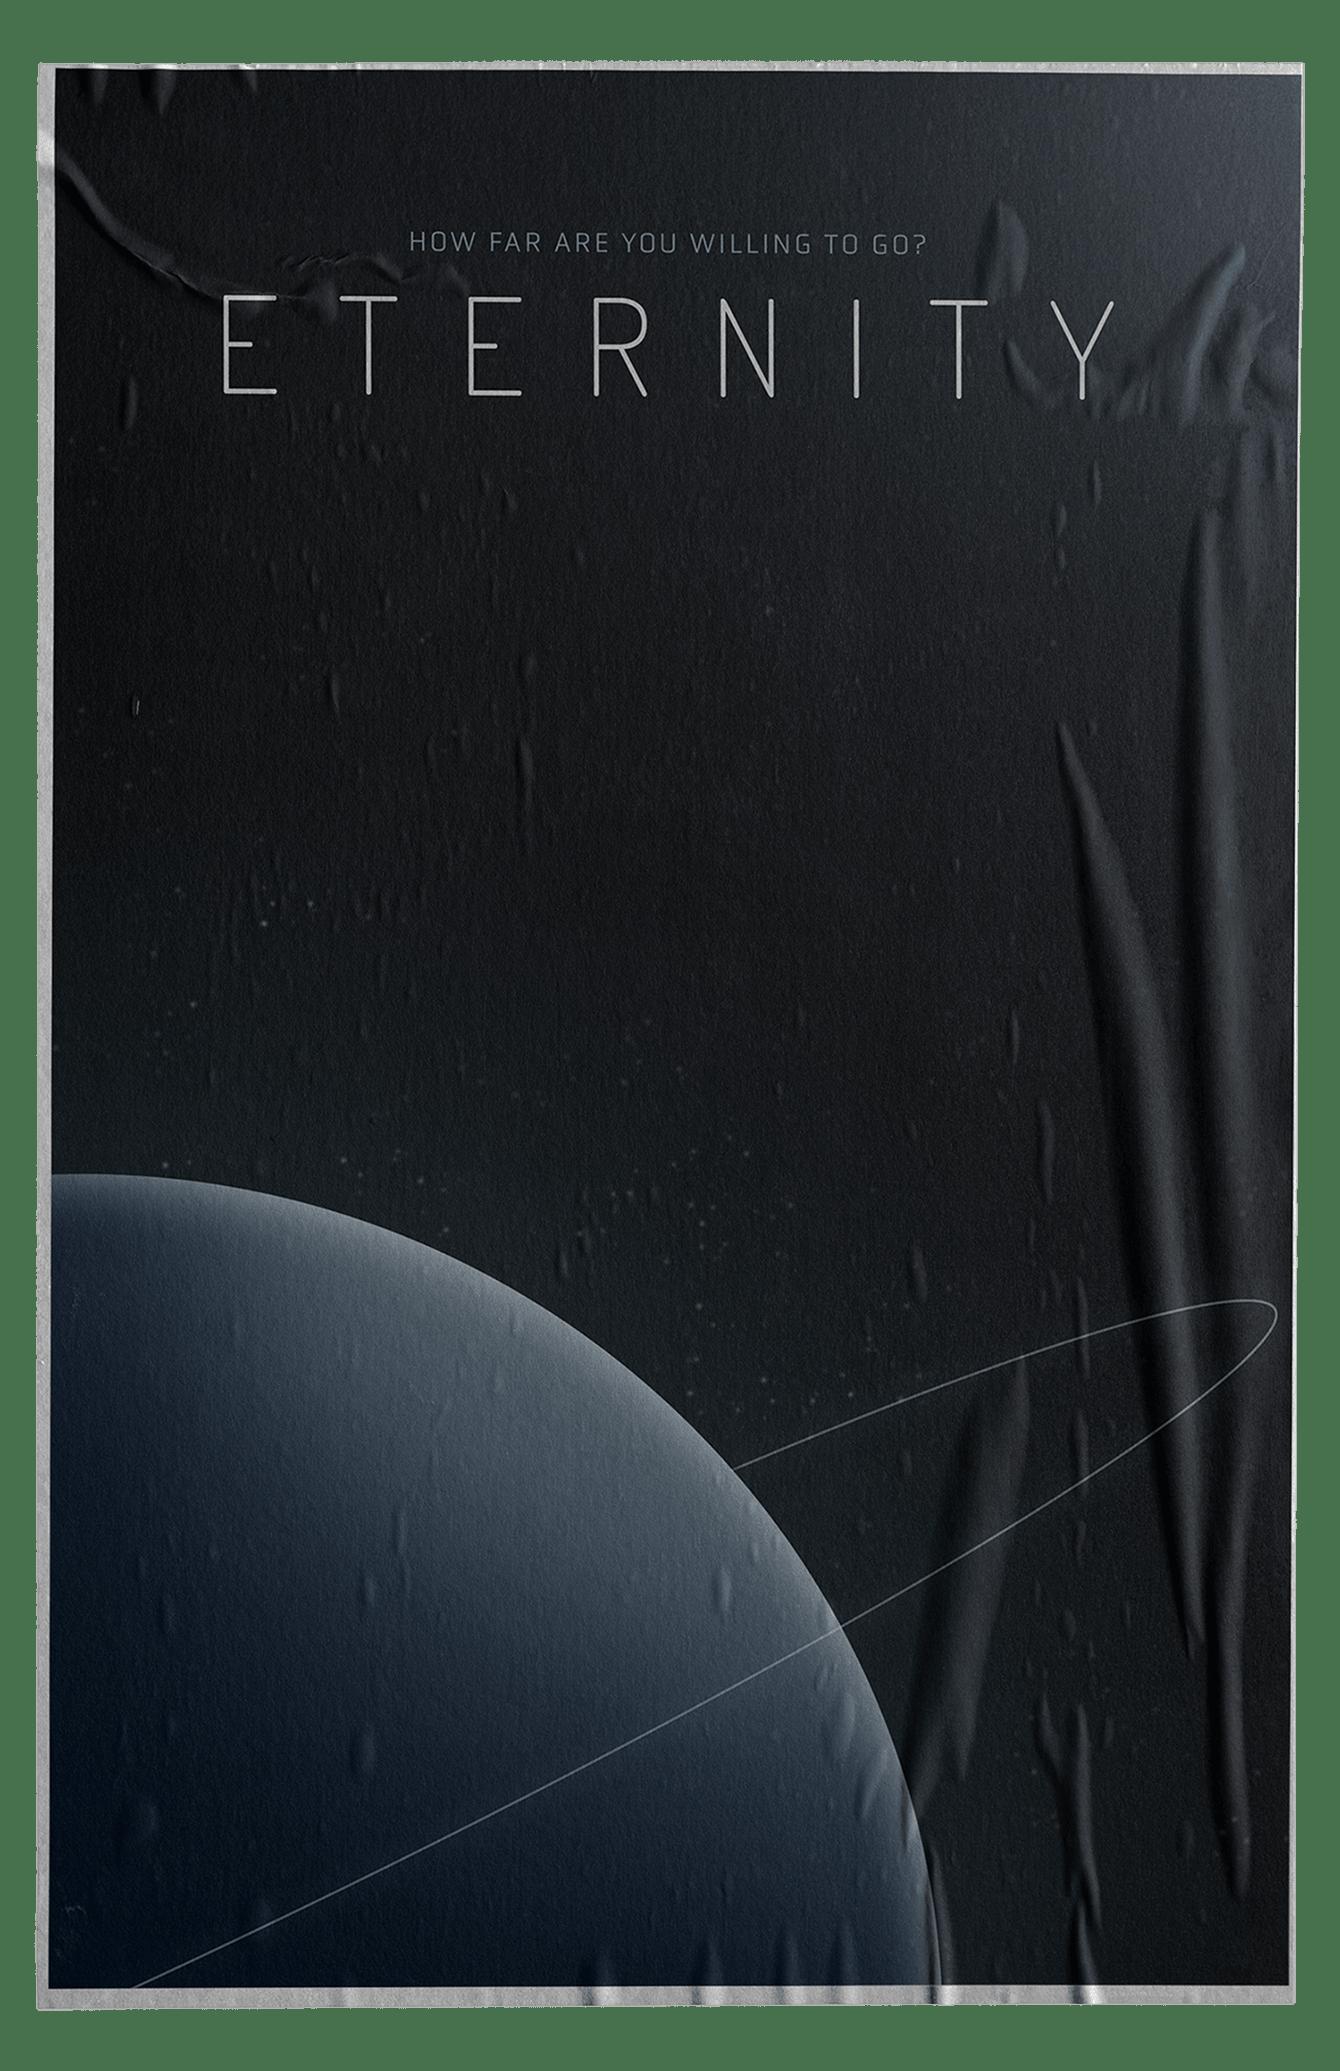 Eternity3-min-min-1